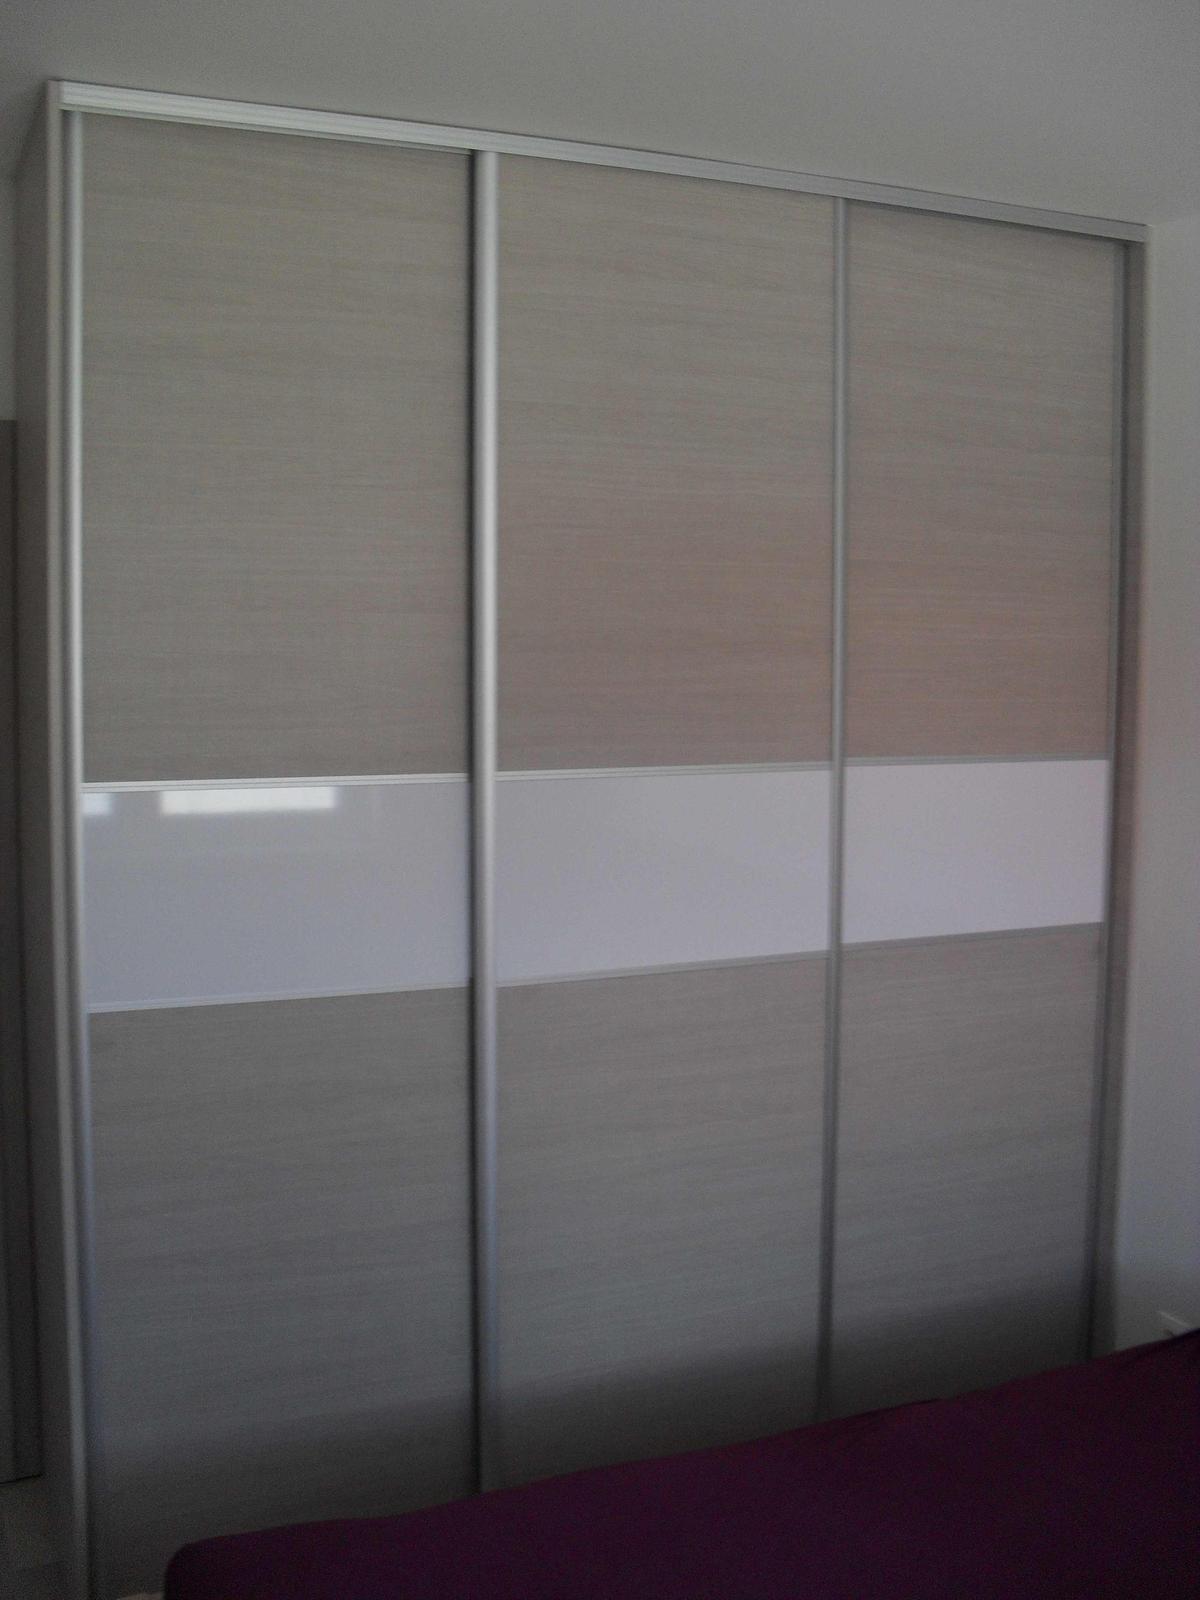 Vstavané skrine Martin Benko Bošany - Obrázok č. 13